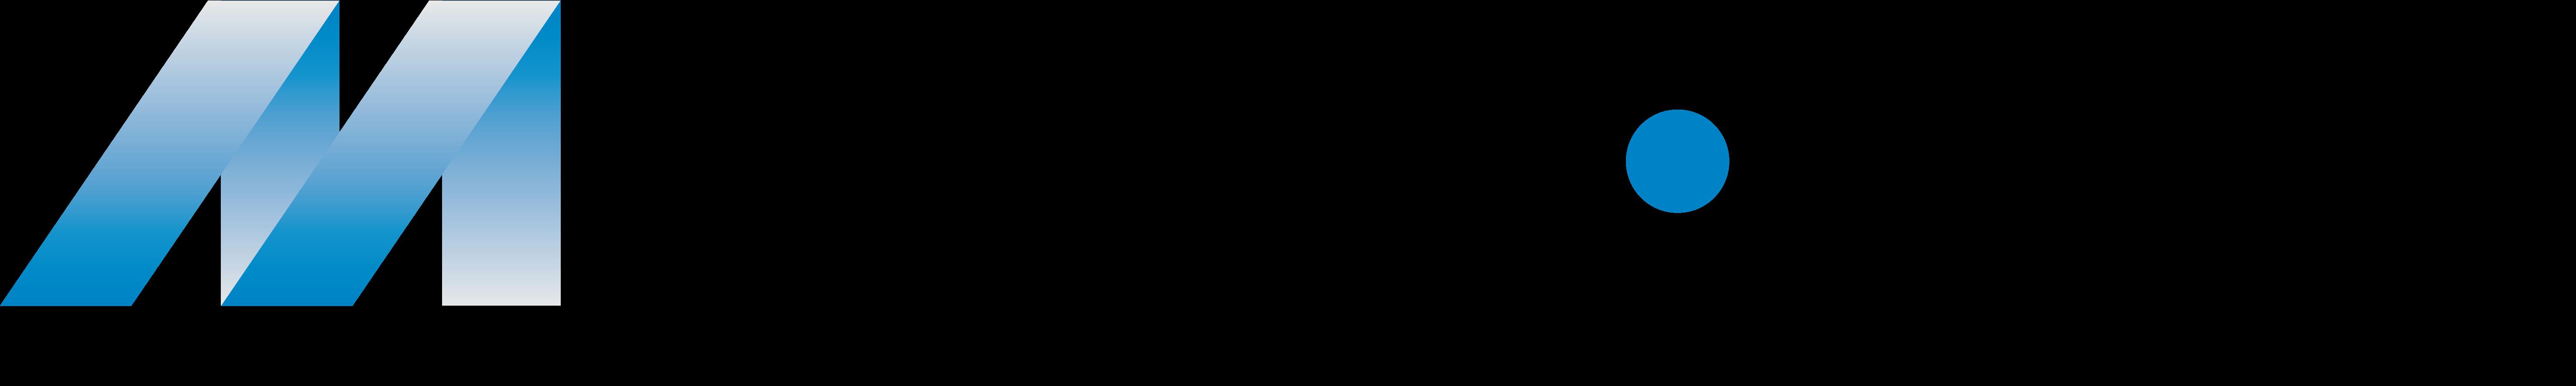 MaxCyte Logo 2021